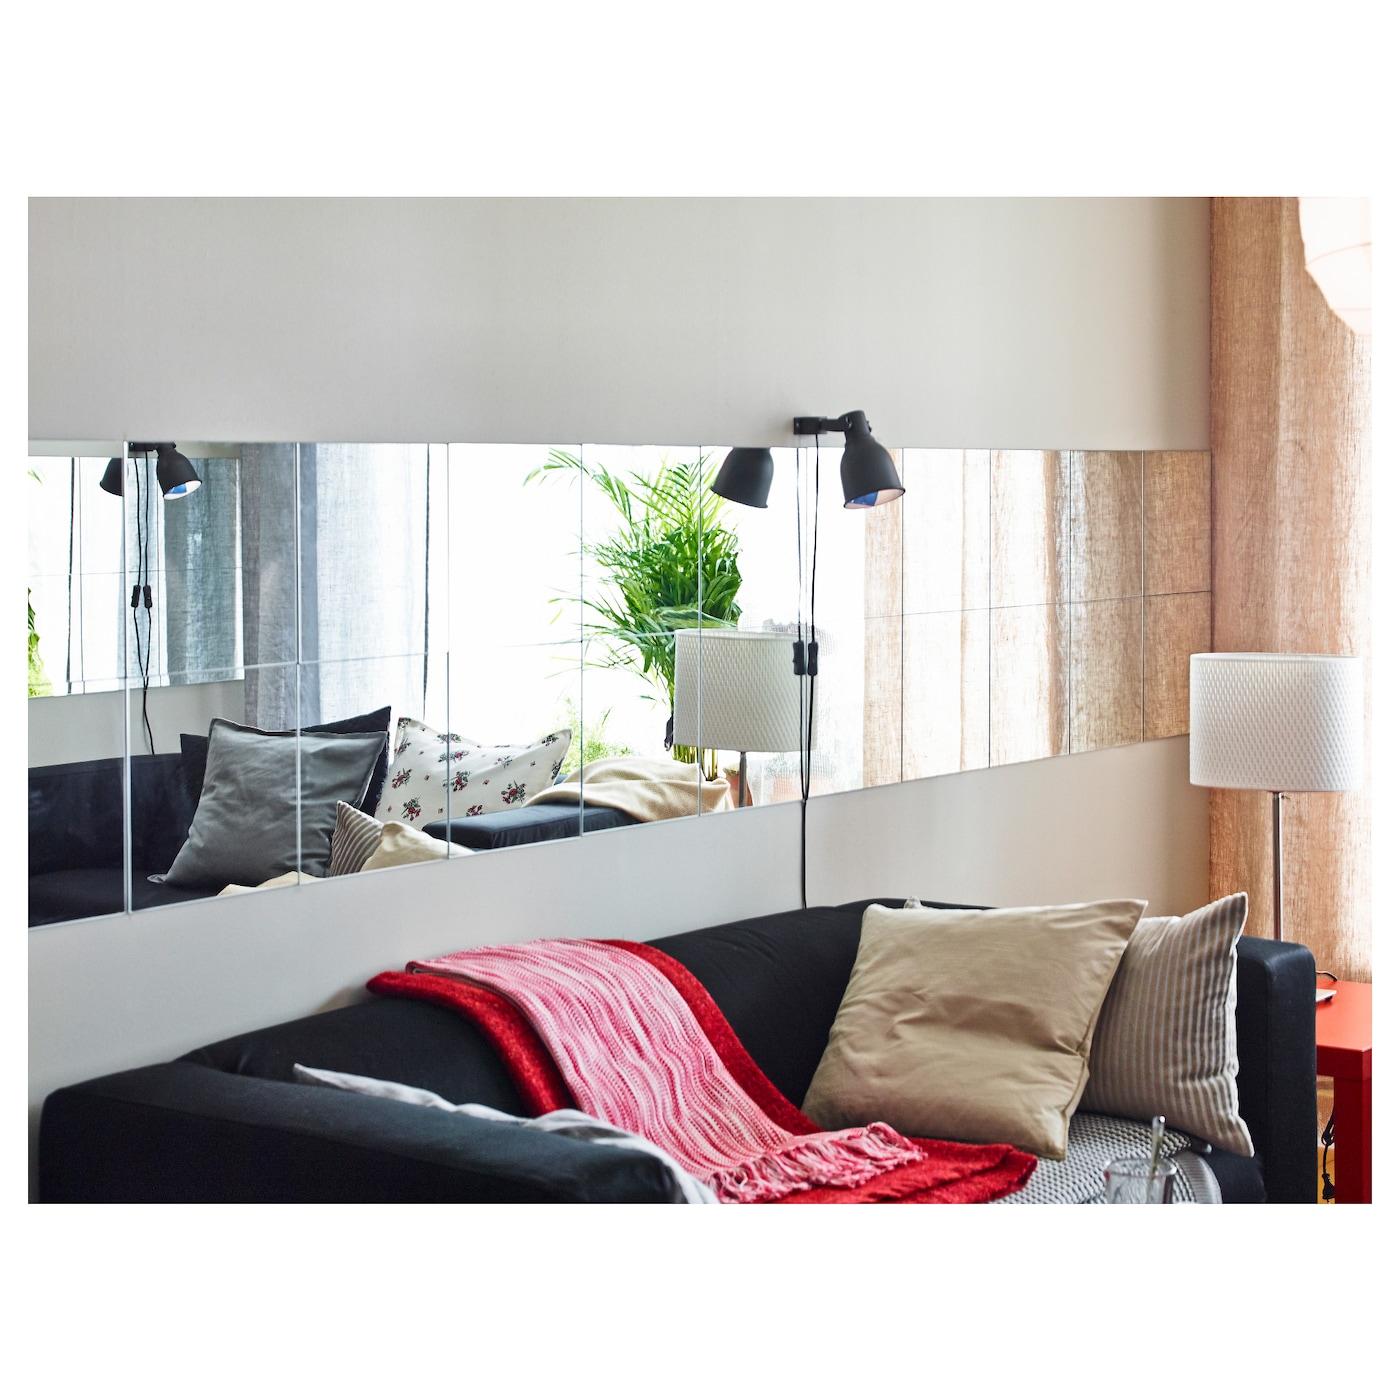 lots mirror 30 x 30 cm ikea. Black Bedroom Furniture Sets. Home Design Ideas